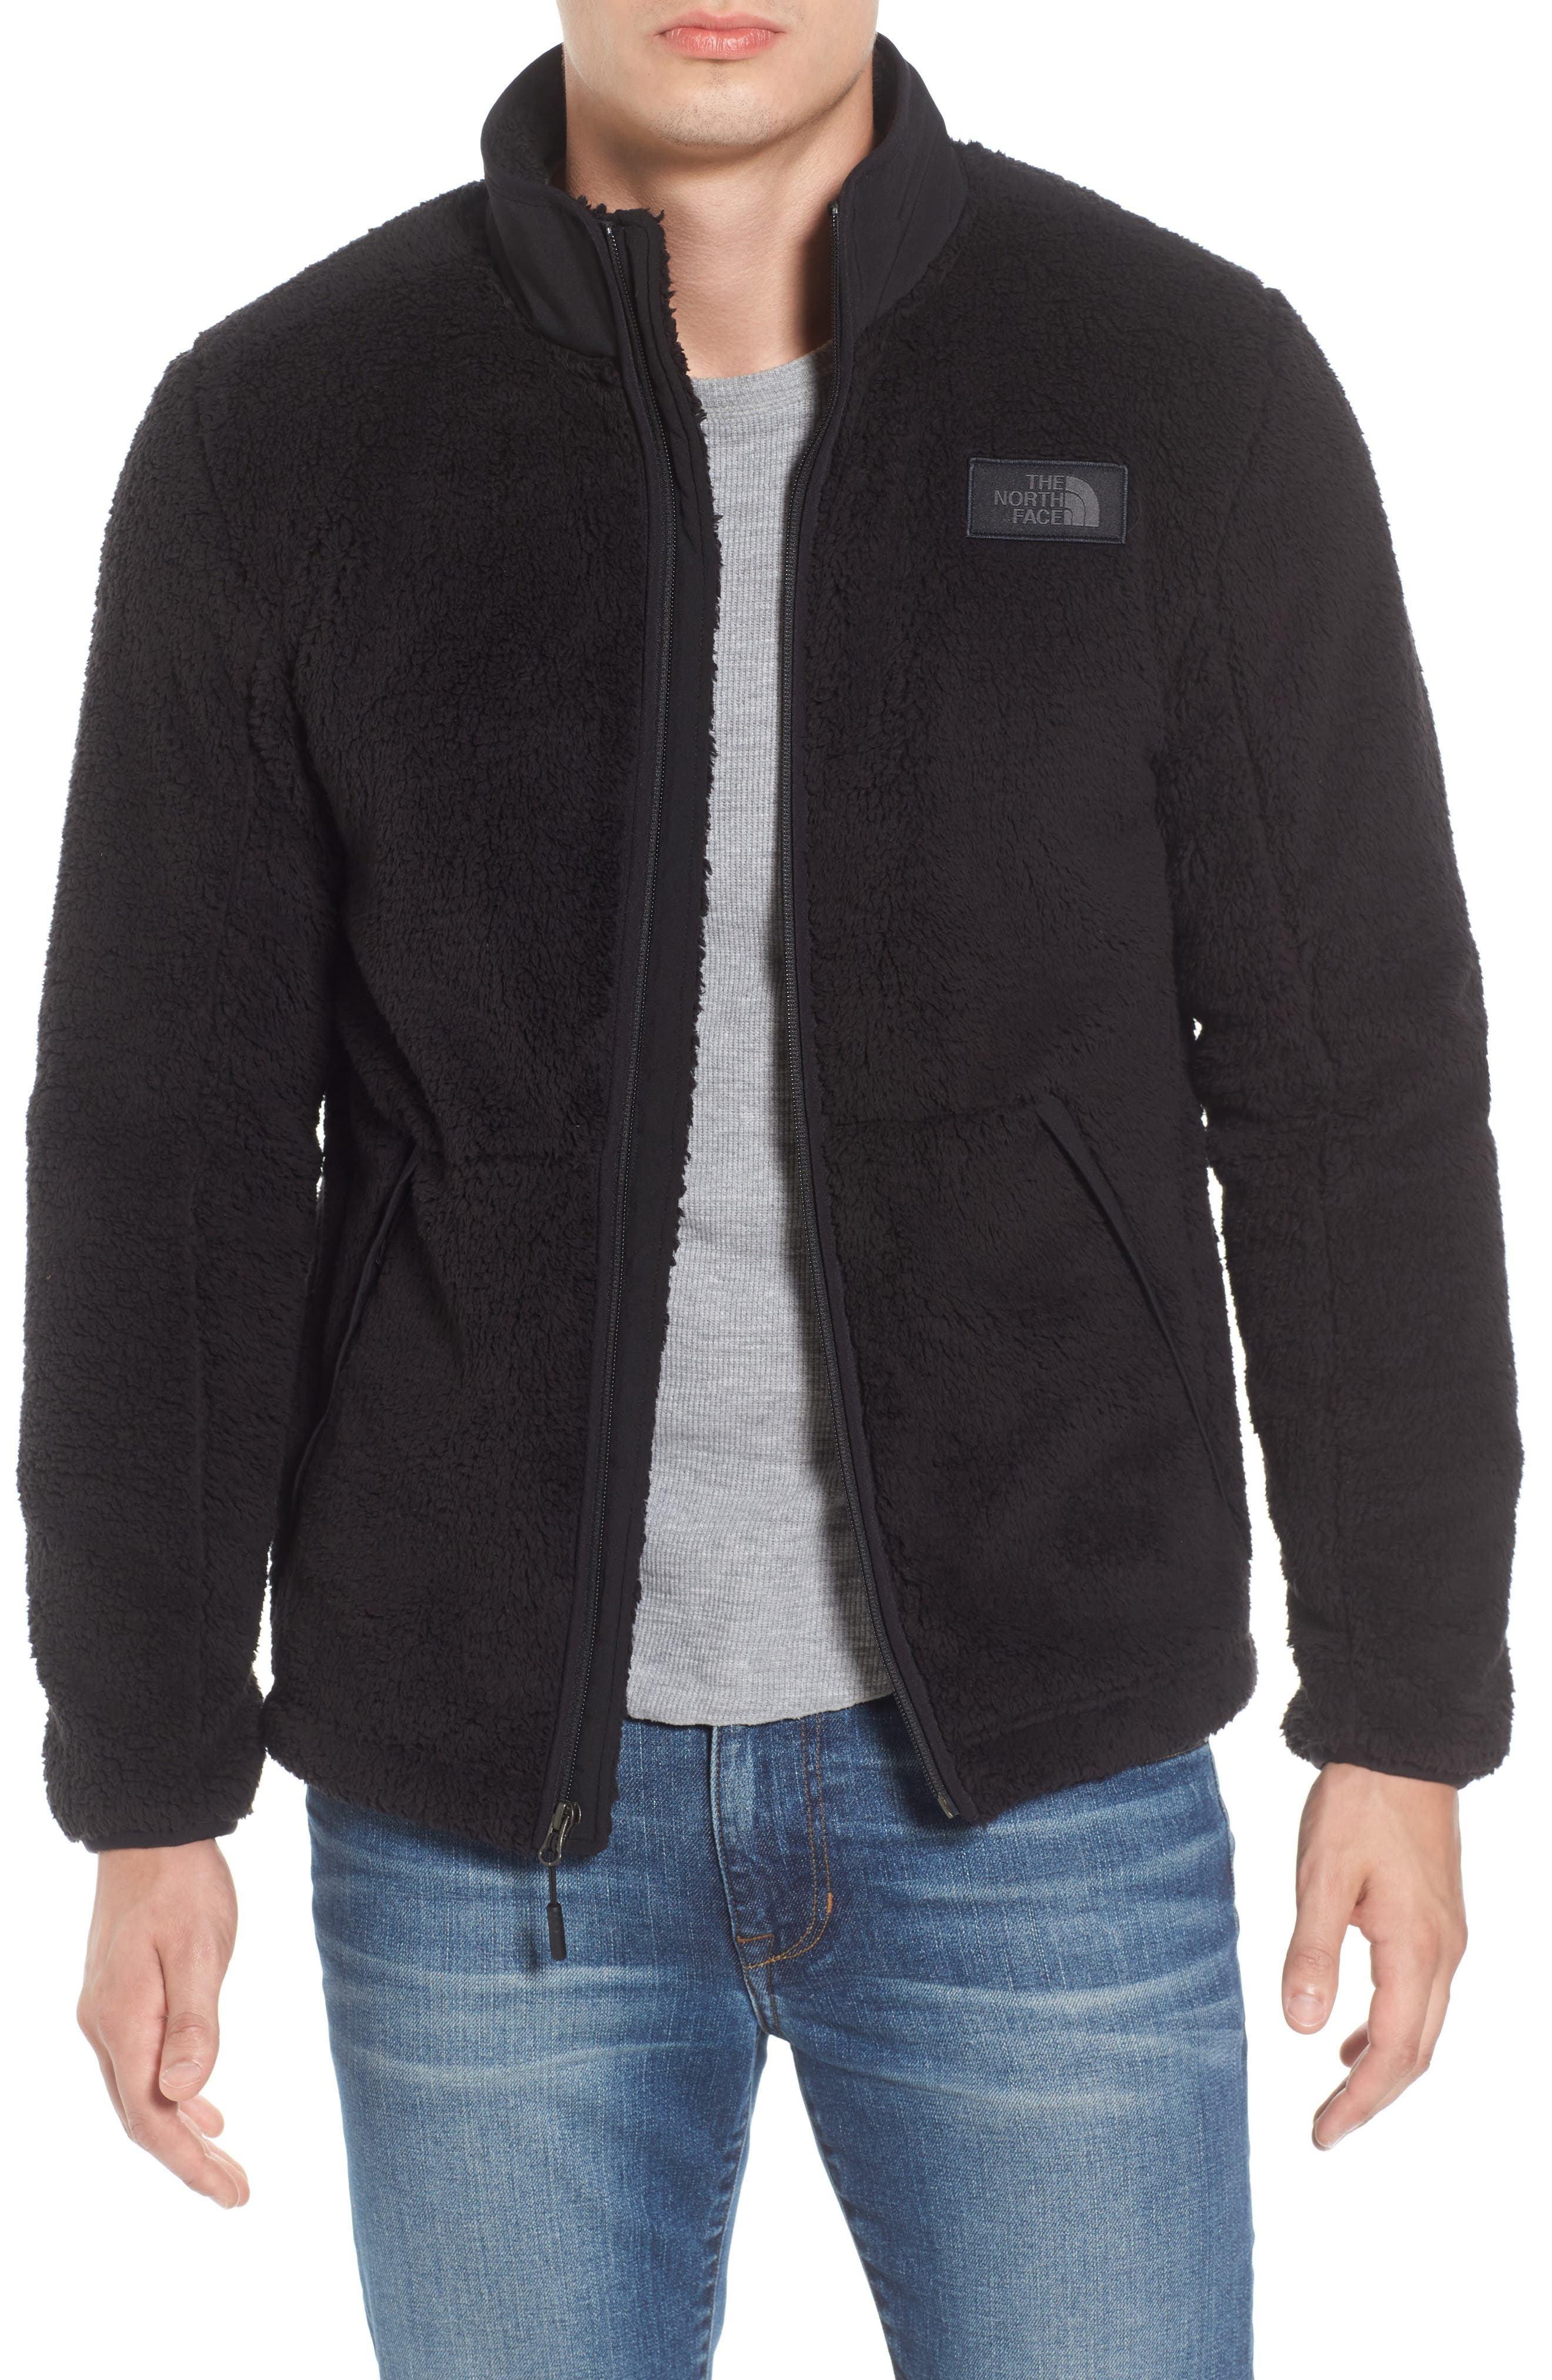 THE NORTH FACE, Campshire Zip Fleece Jacket, Main thumbnail 1, color, 001